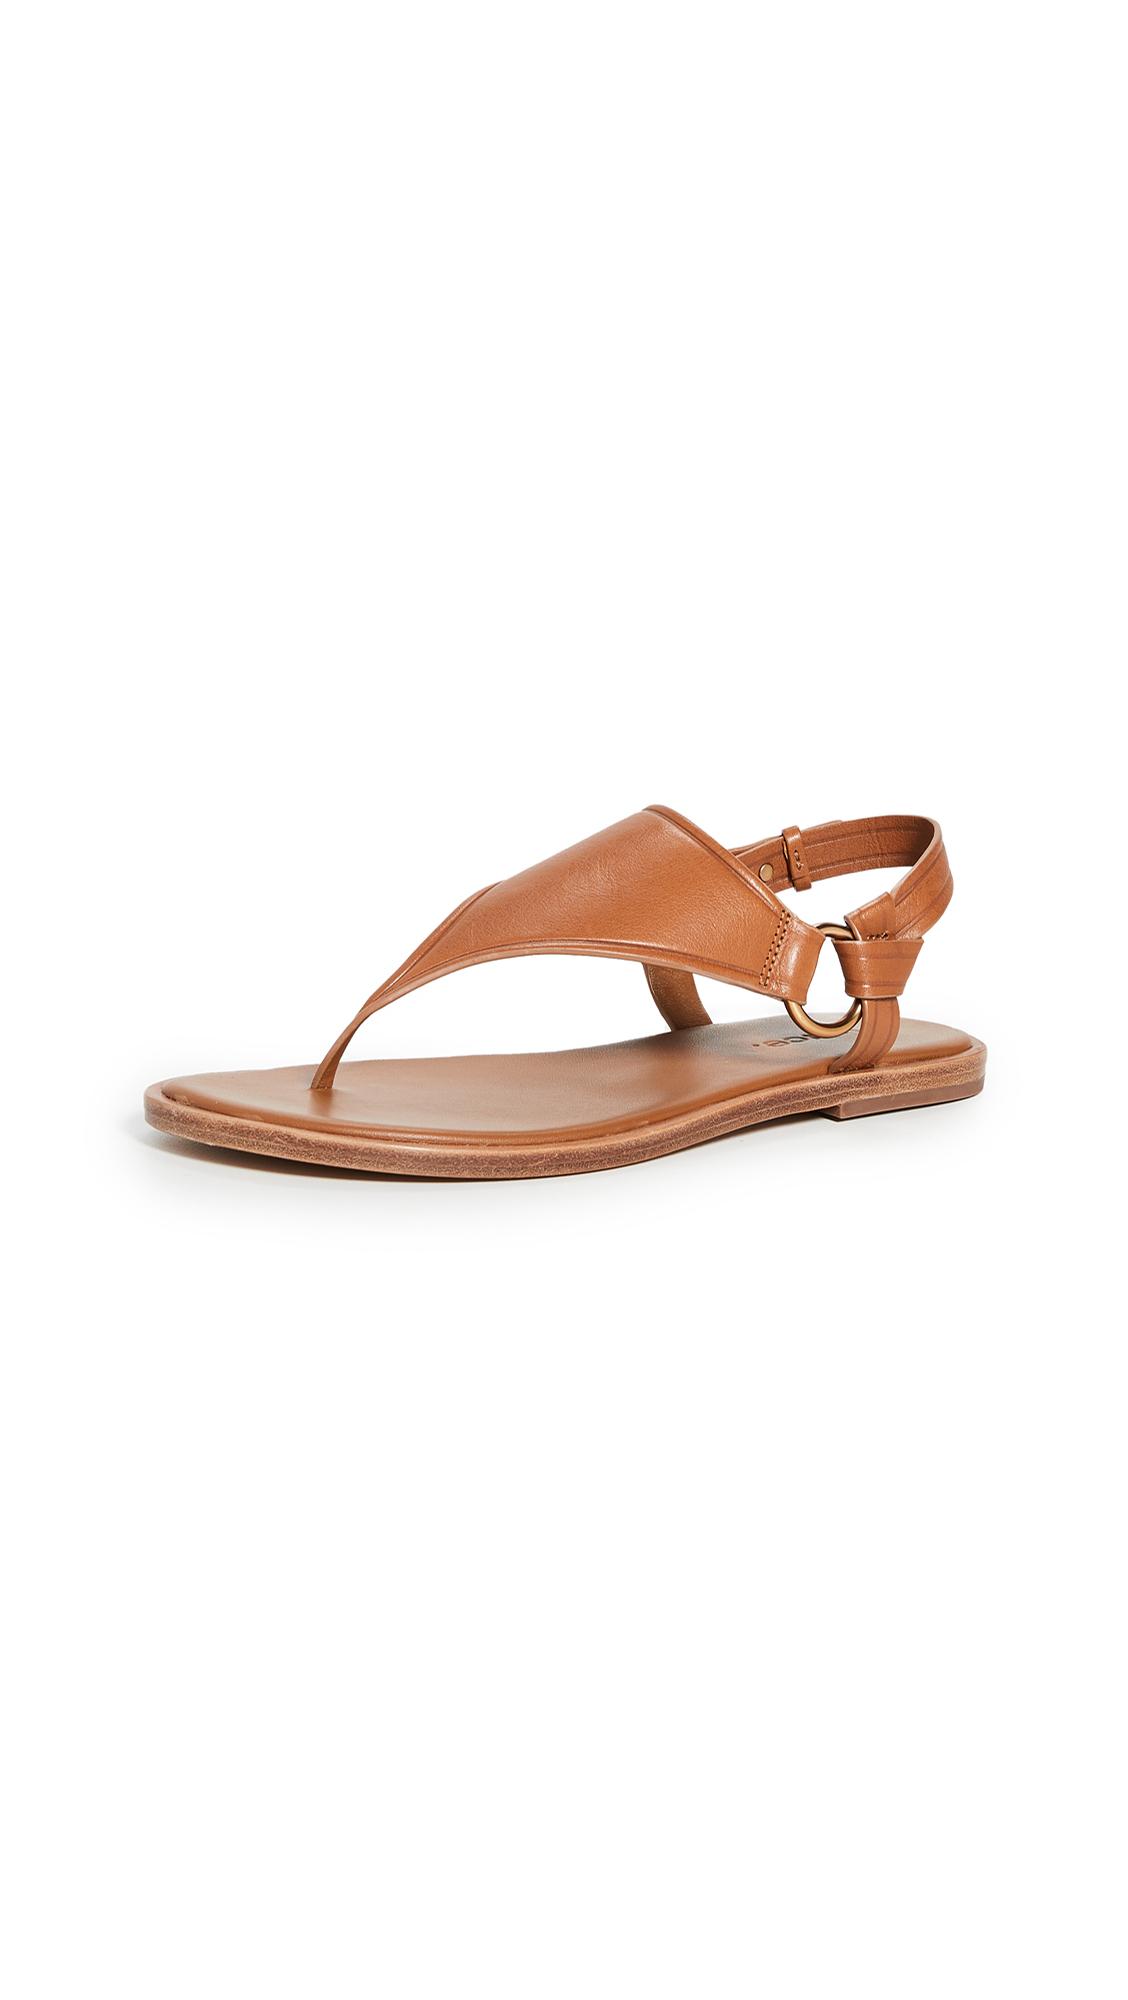 Buy Vince Pharis Sandals online, shop Vince